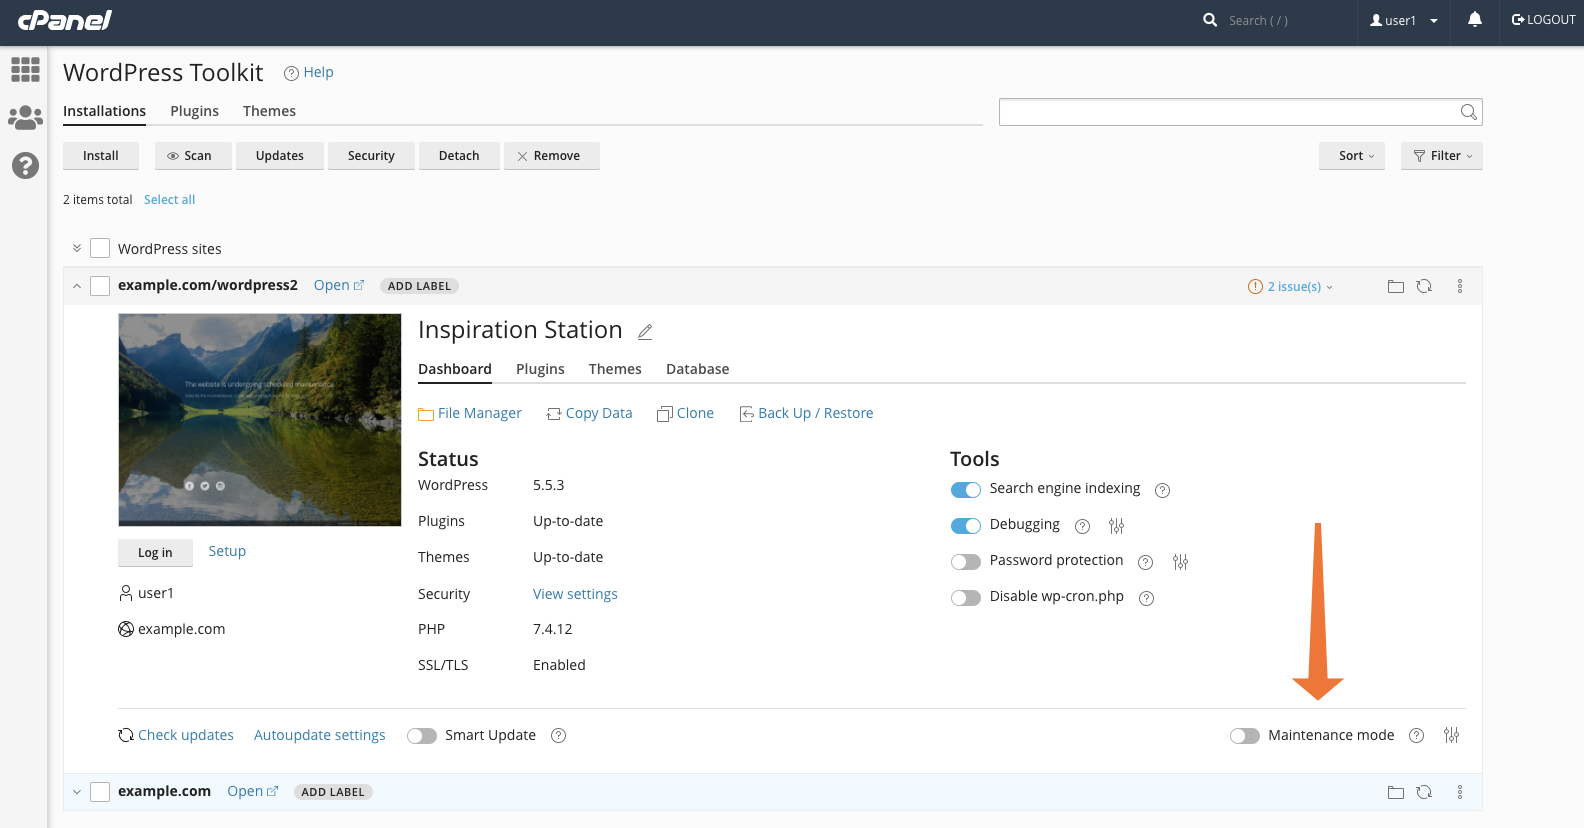 WordPress Toolkit for cPanel maintenance Mode